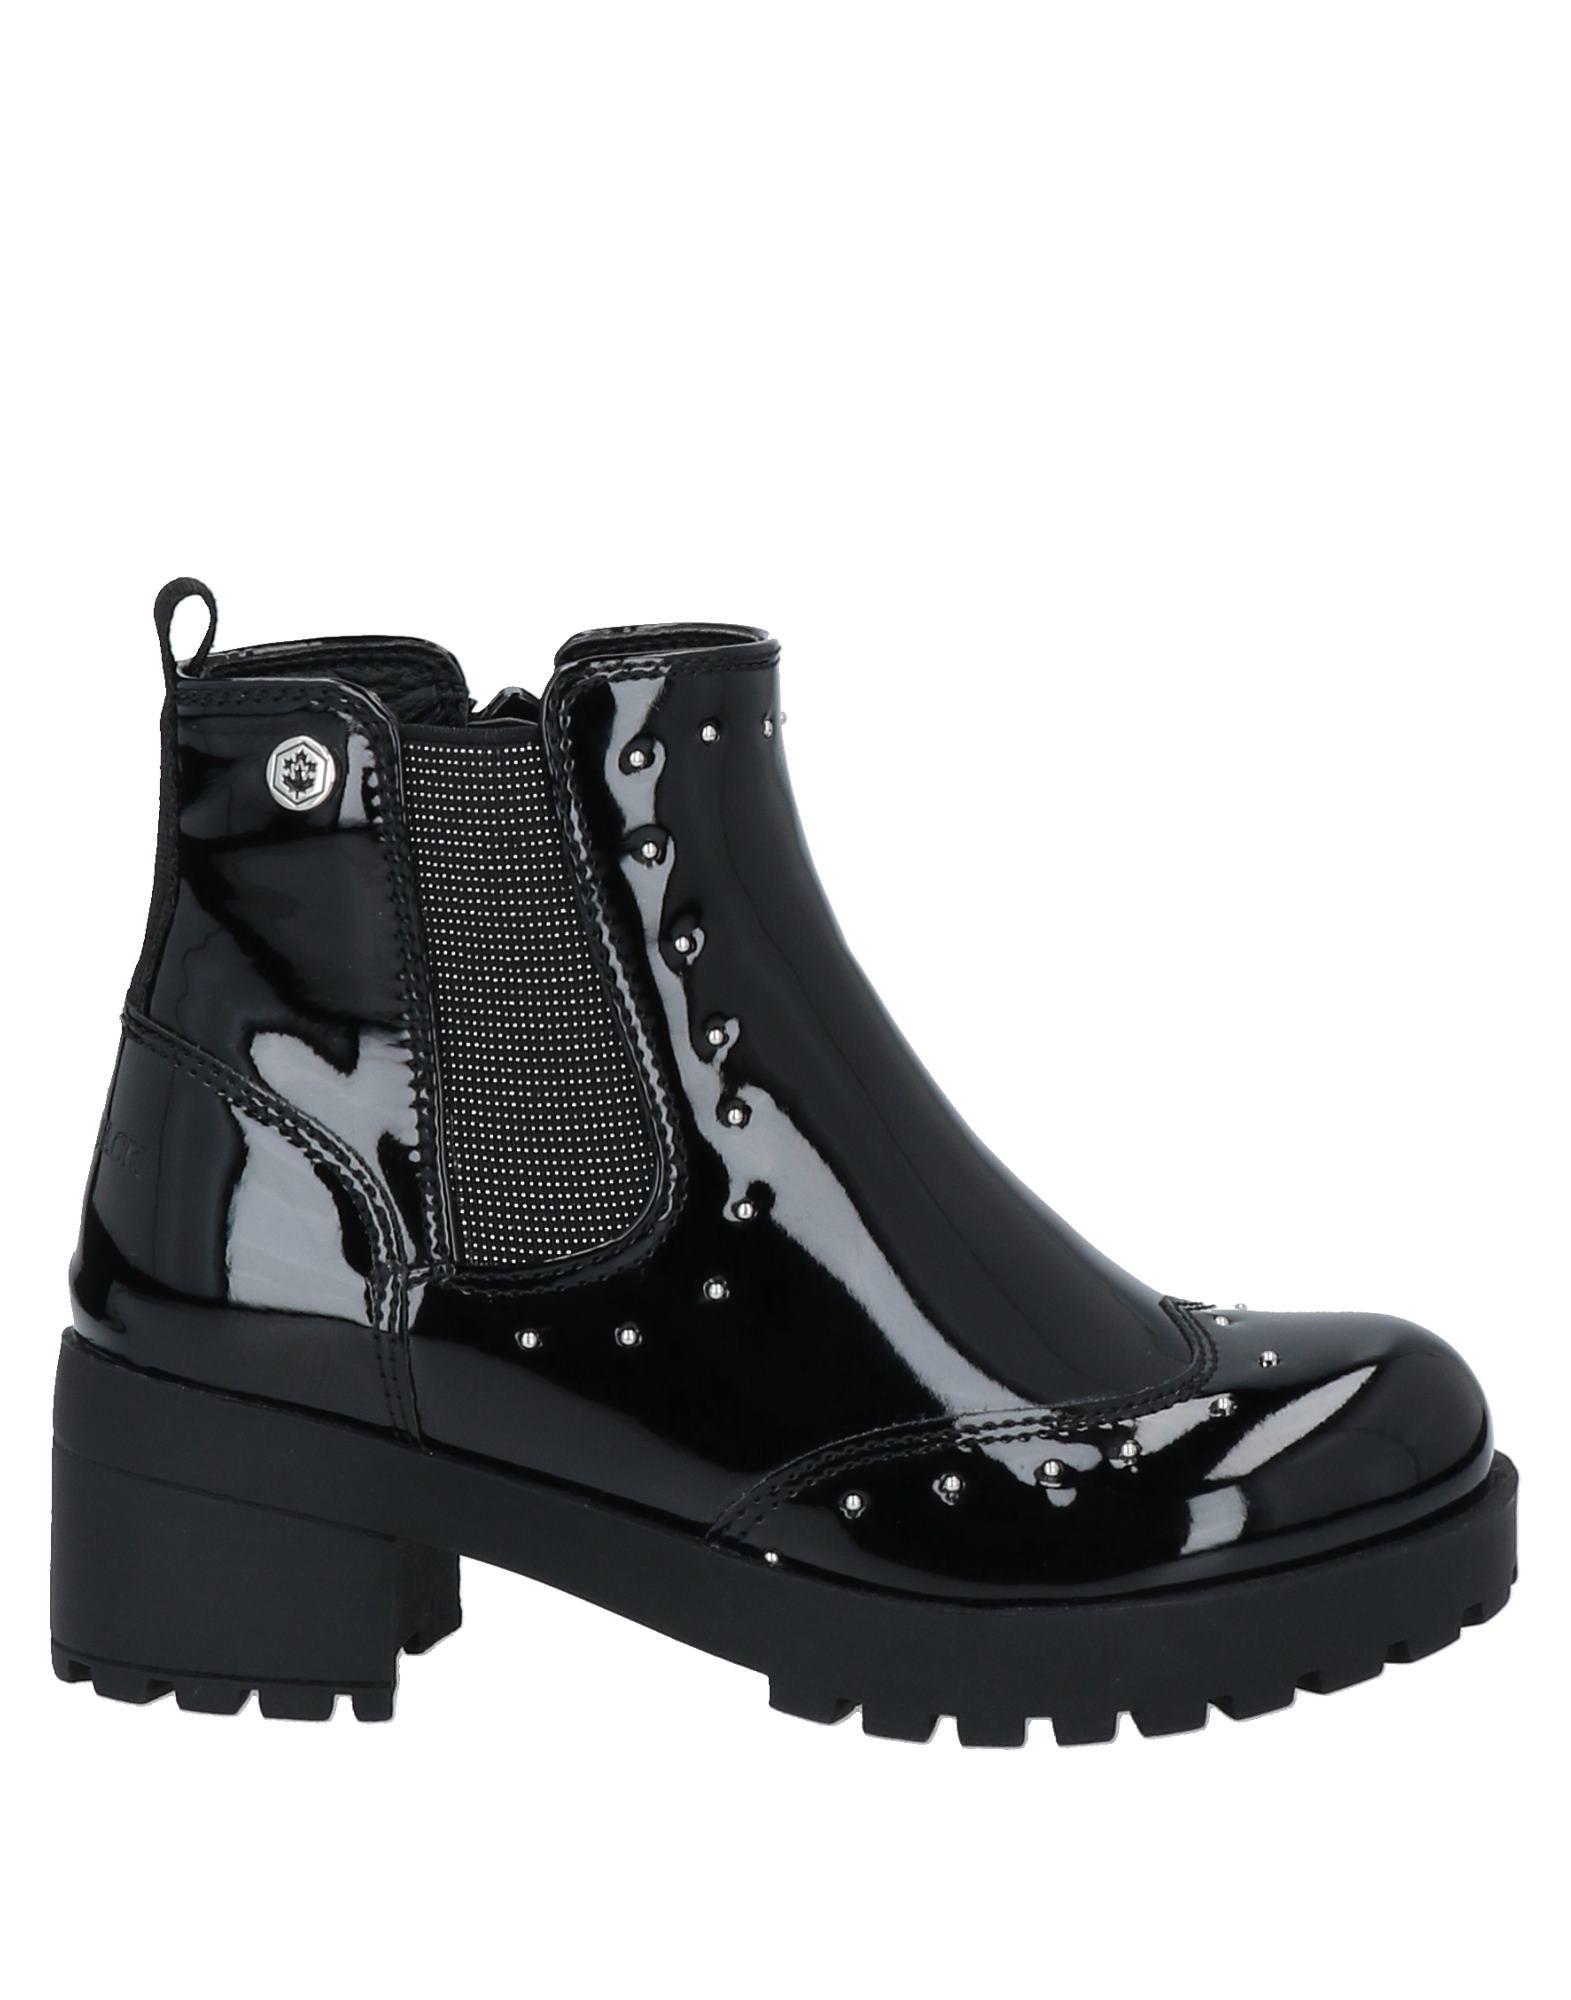 LUMBERJACK ガールズ ショートブーツ ブラック キッズ